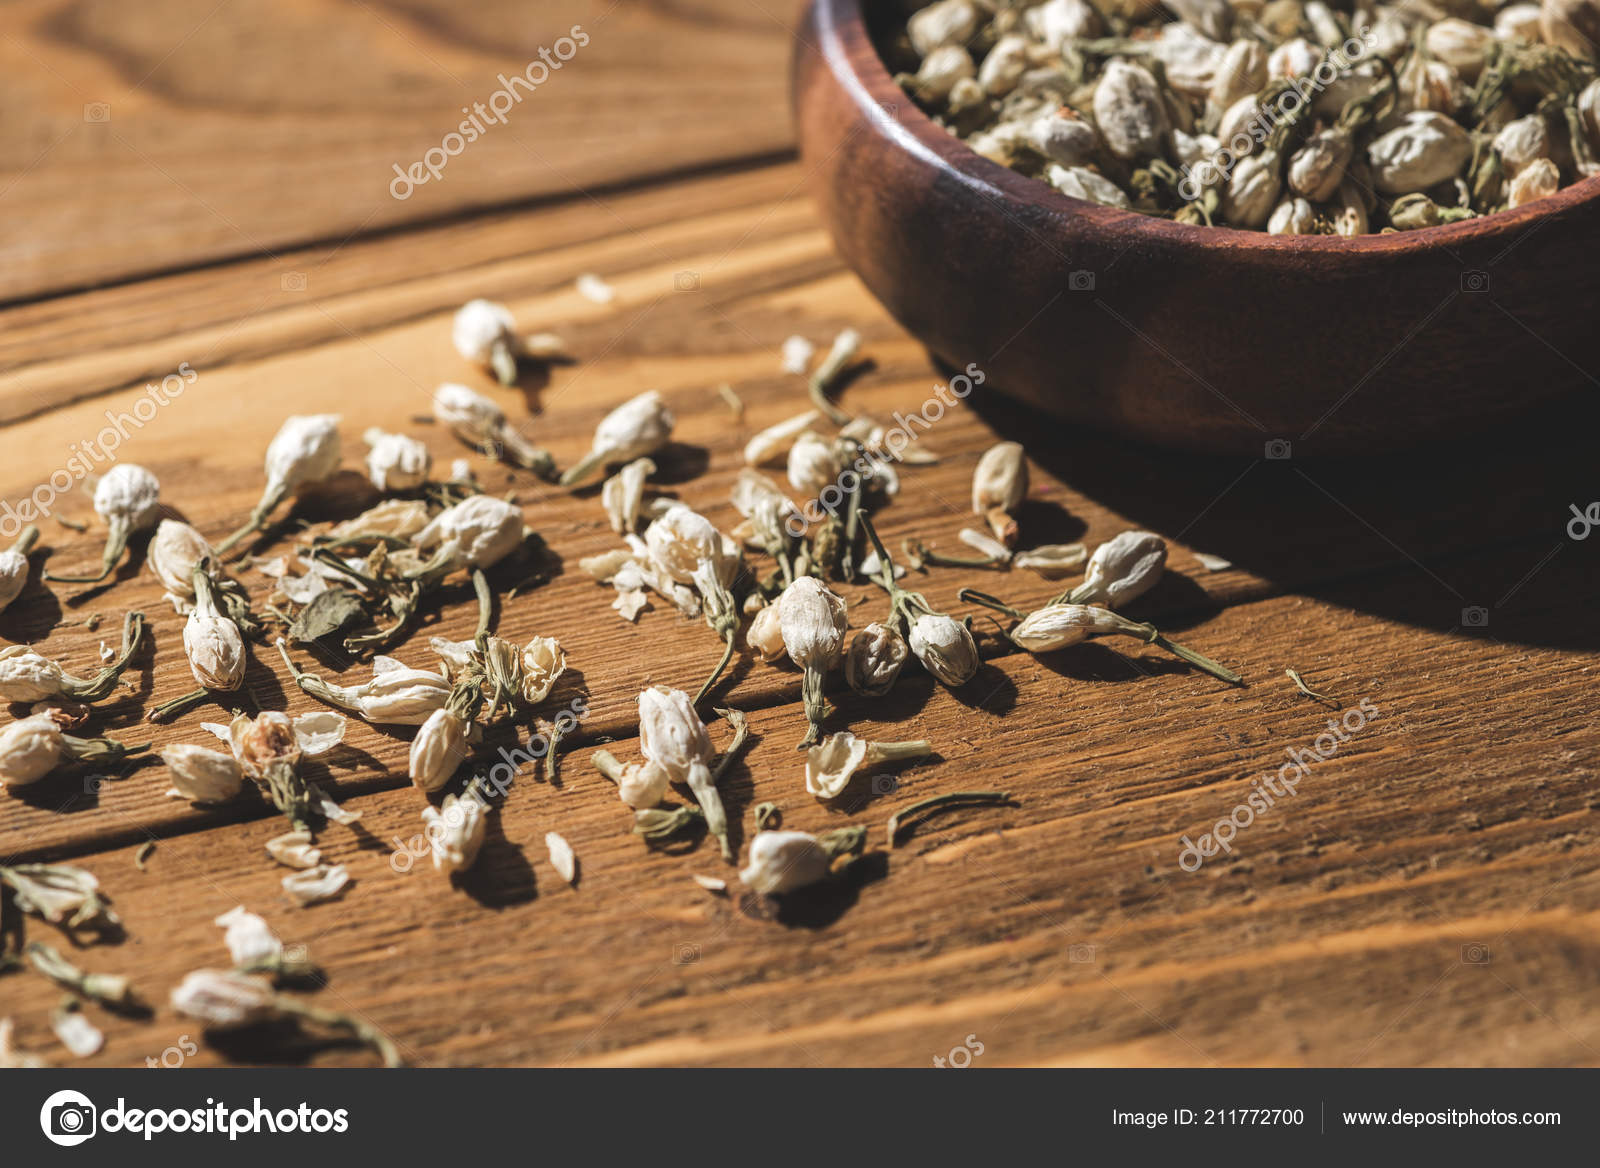 Dried Organic Jasmine Flowers Wooden Bowl Wooden Table Foto De